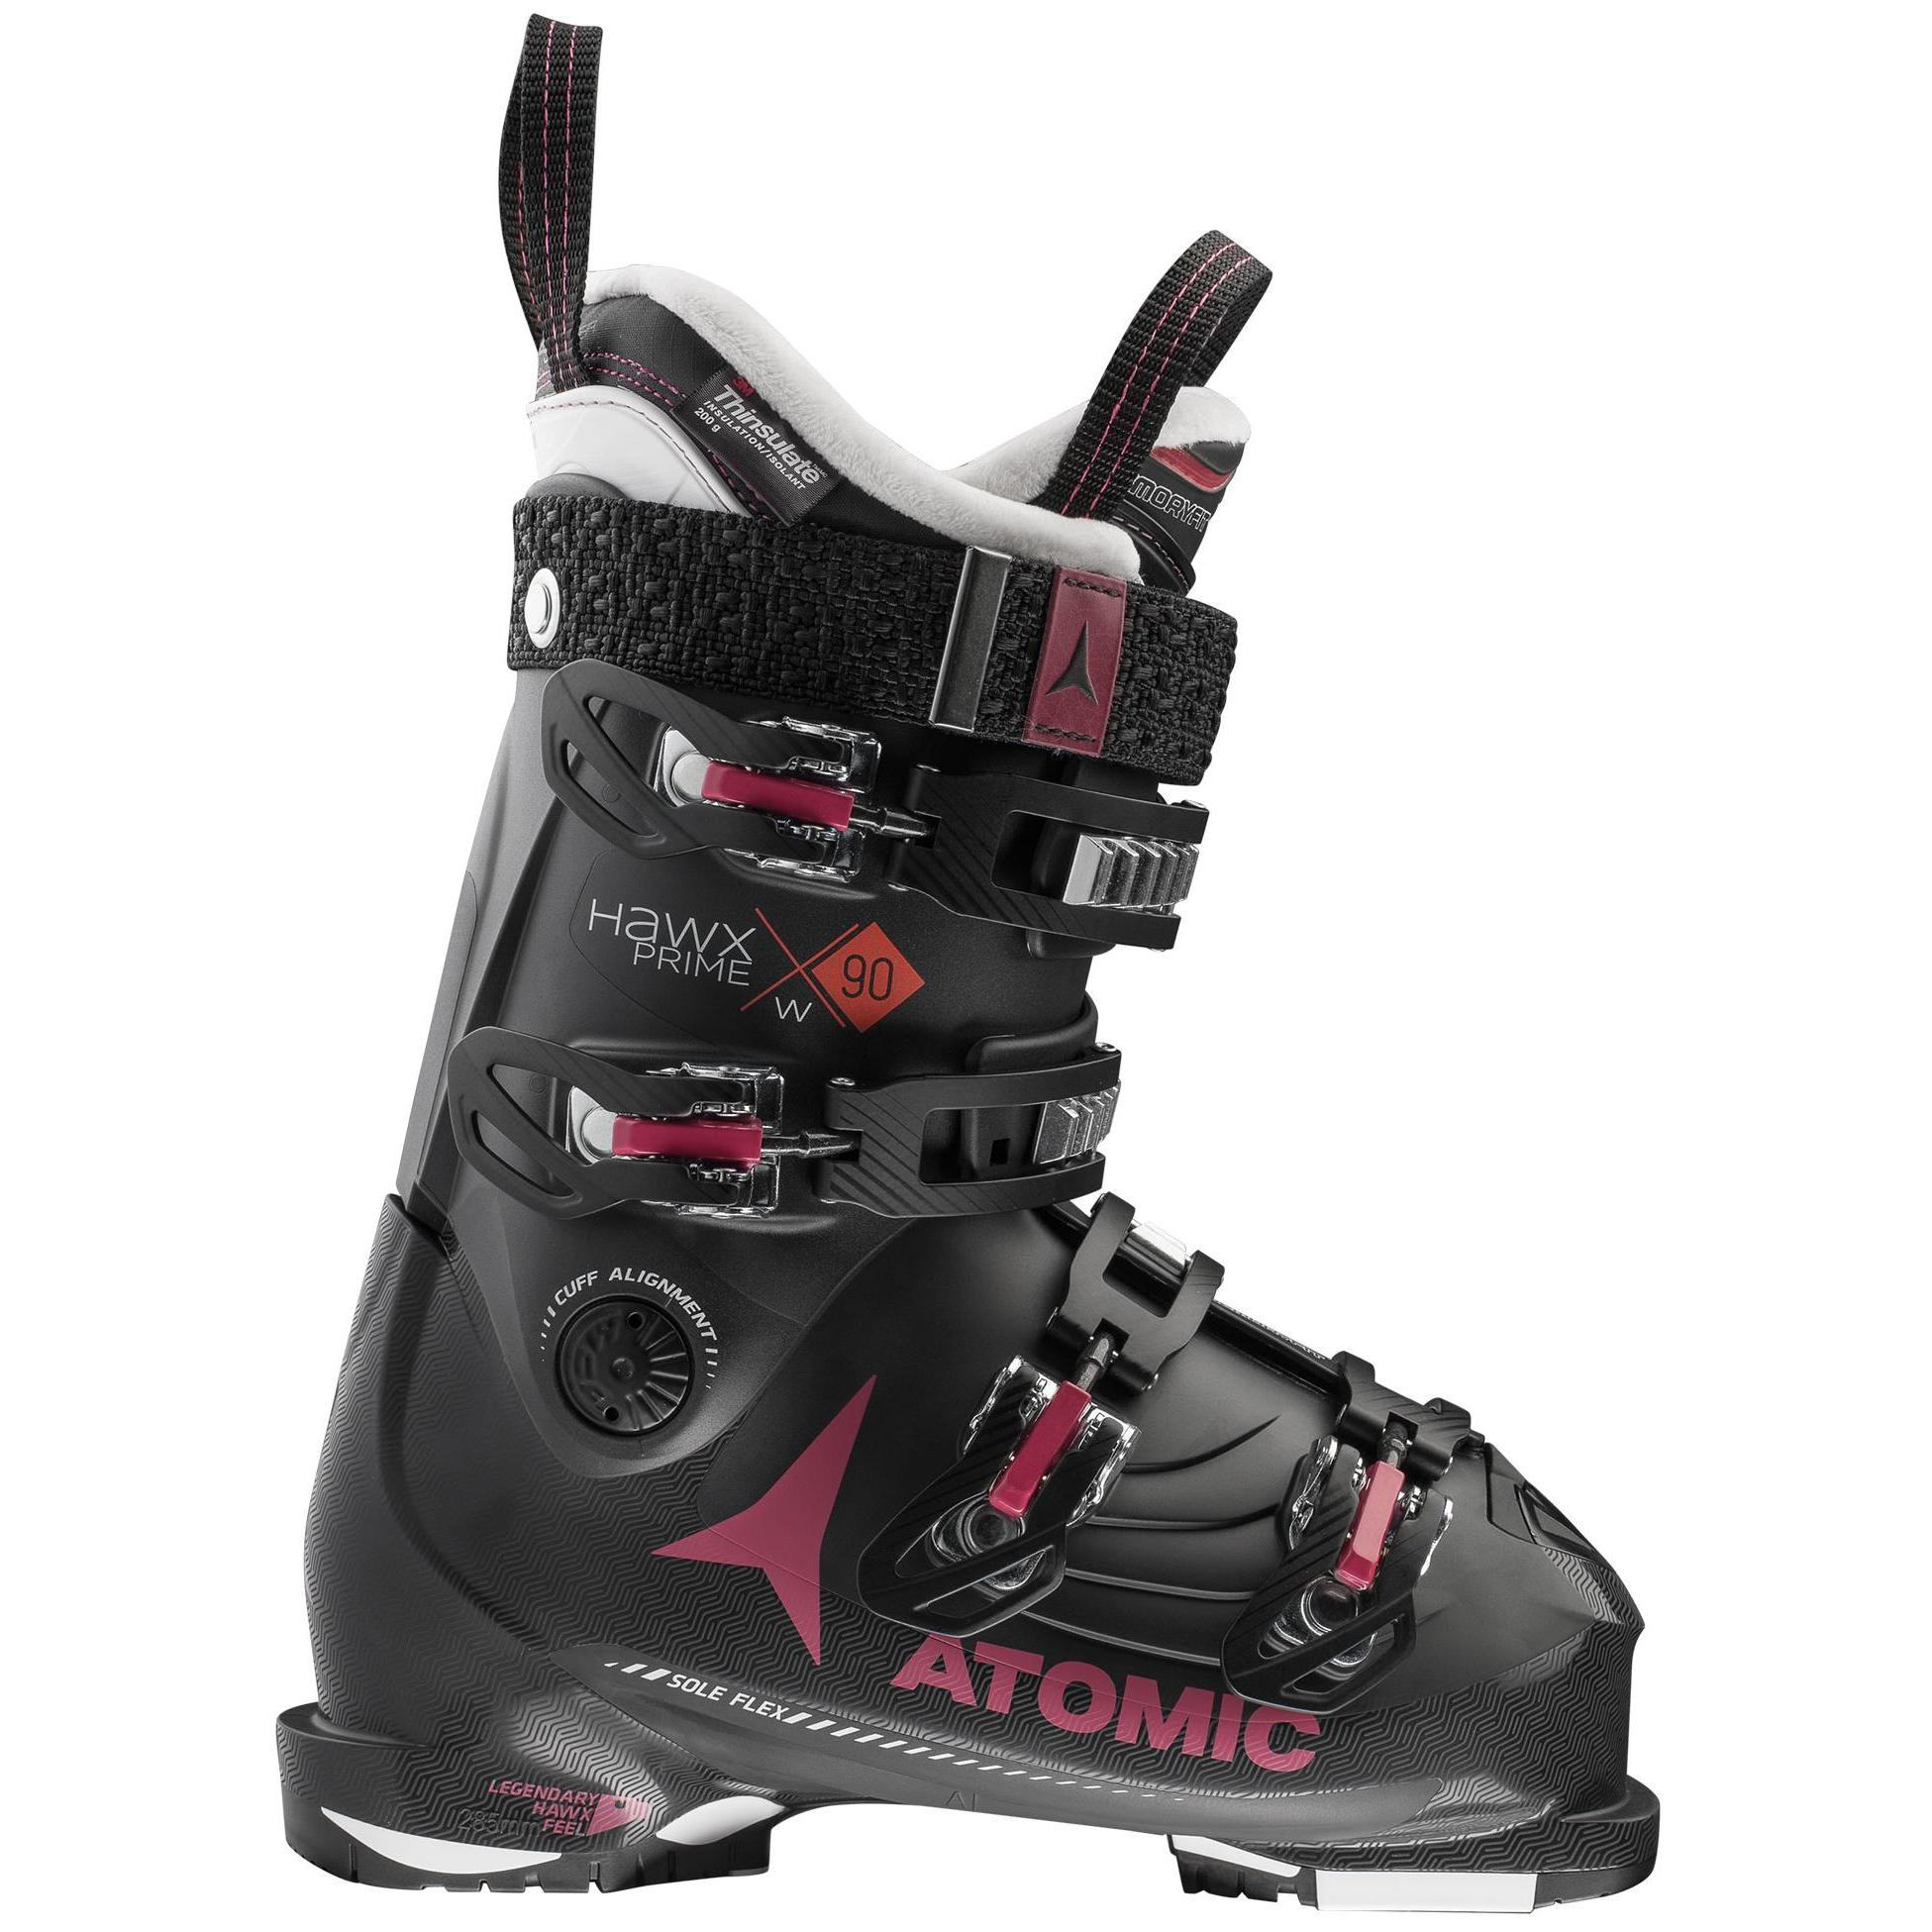 c2e6bcb3188b Горнолыжные ботинки Atomic 2018-19 HAWX PRIME 90 W Black Rust ...